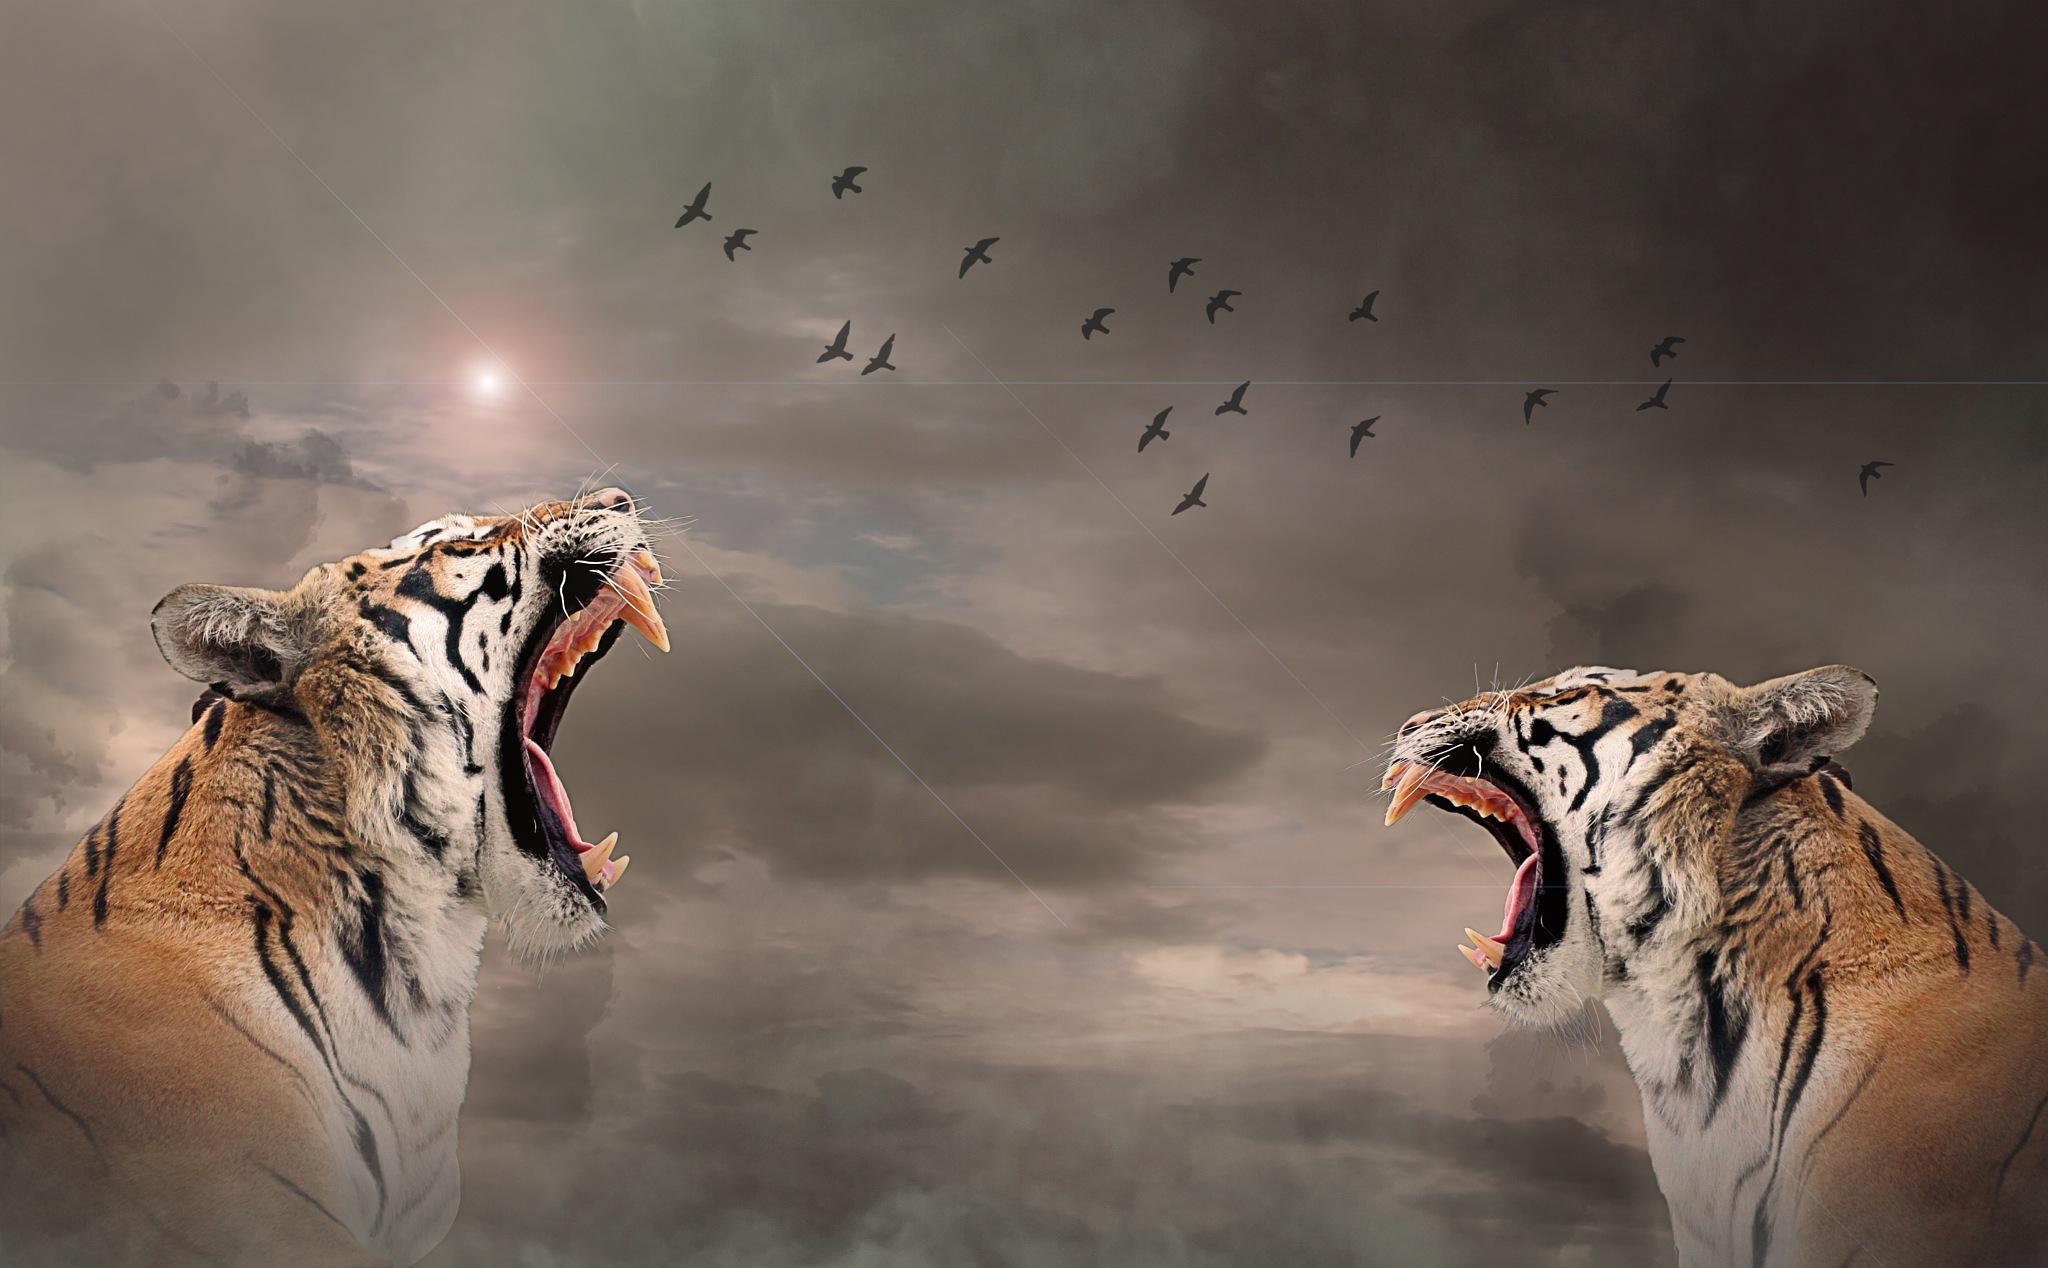 Tigers by Richard Thiel Sartawsky